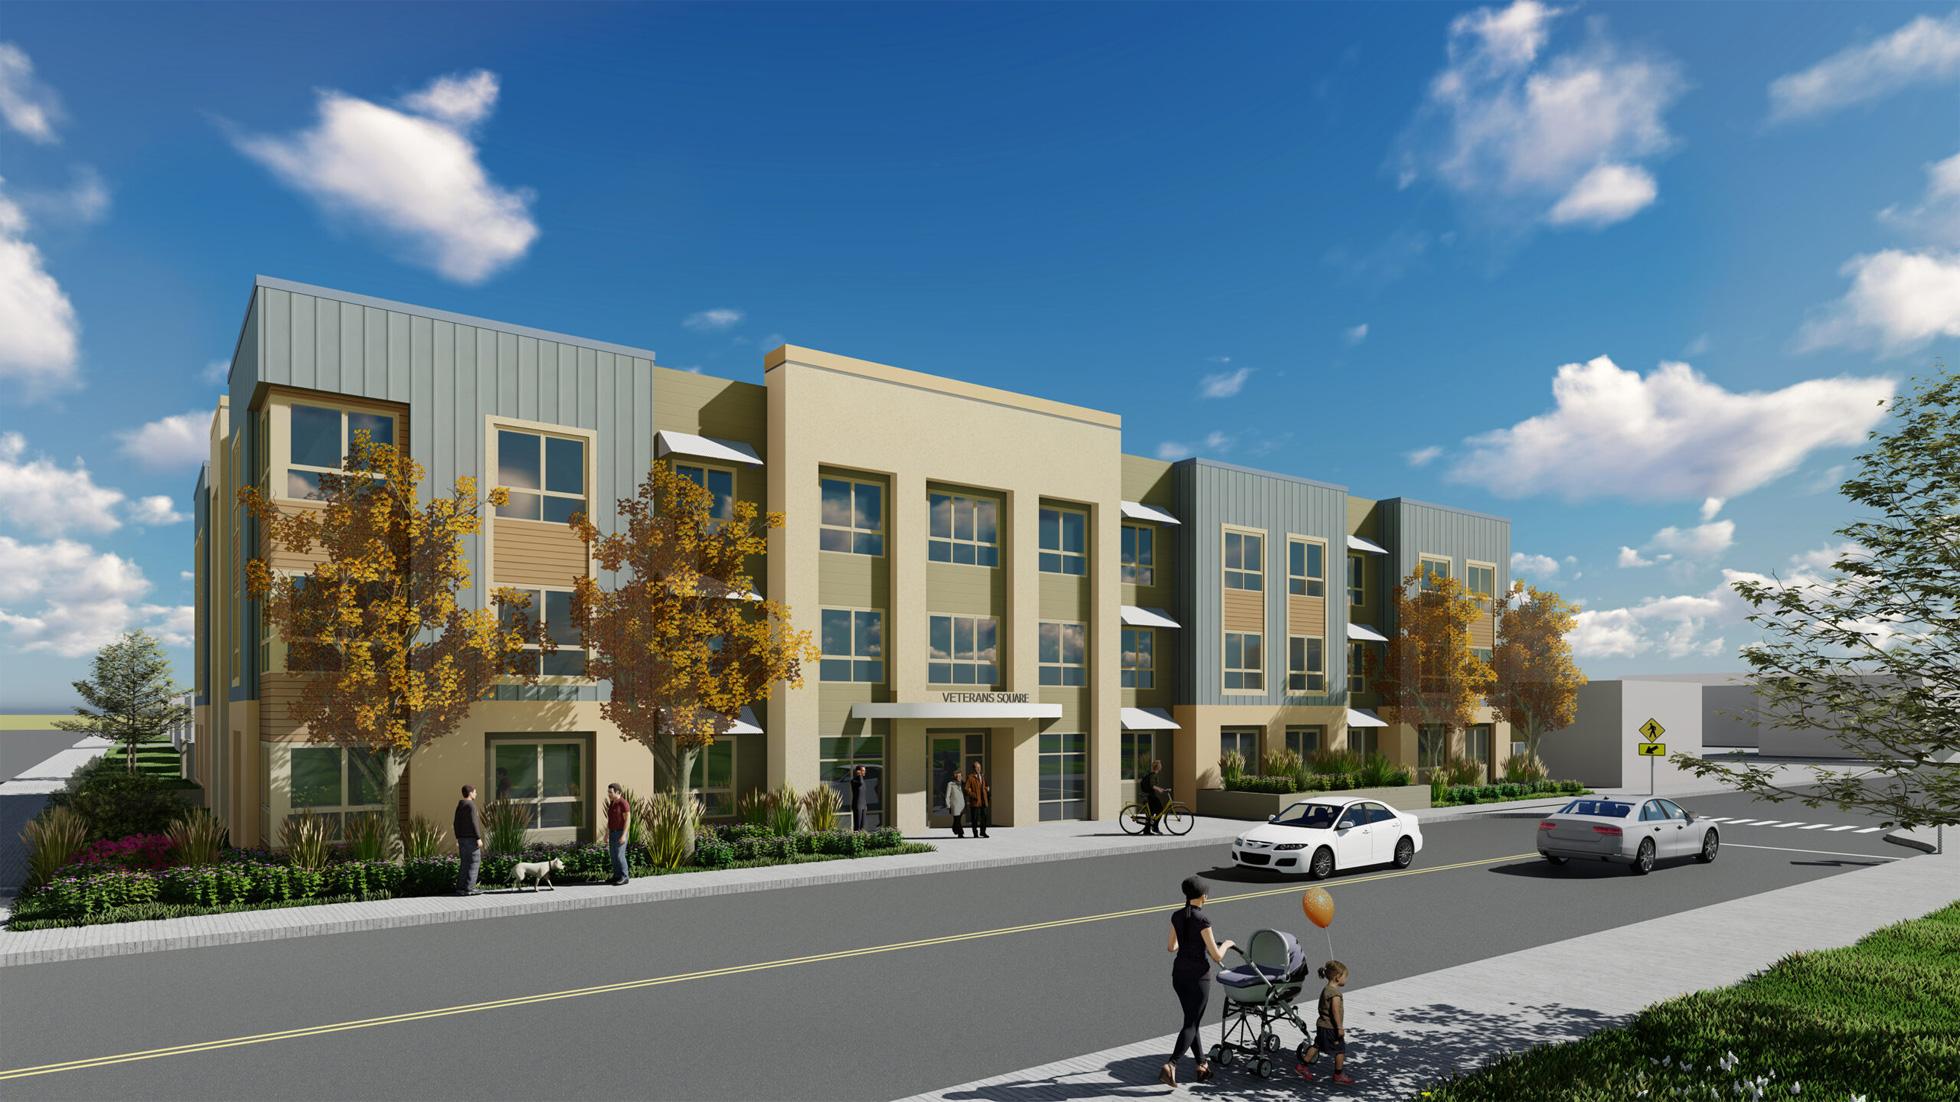 Apple deploys 1 billion in affordable housing support across California rendering 071421